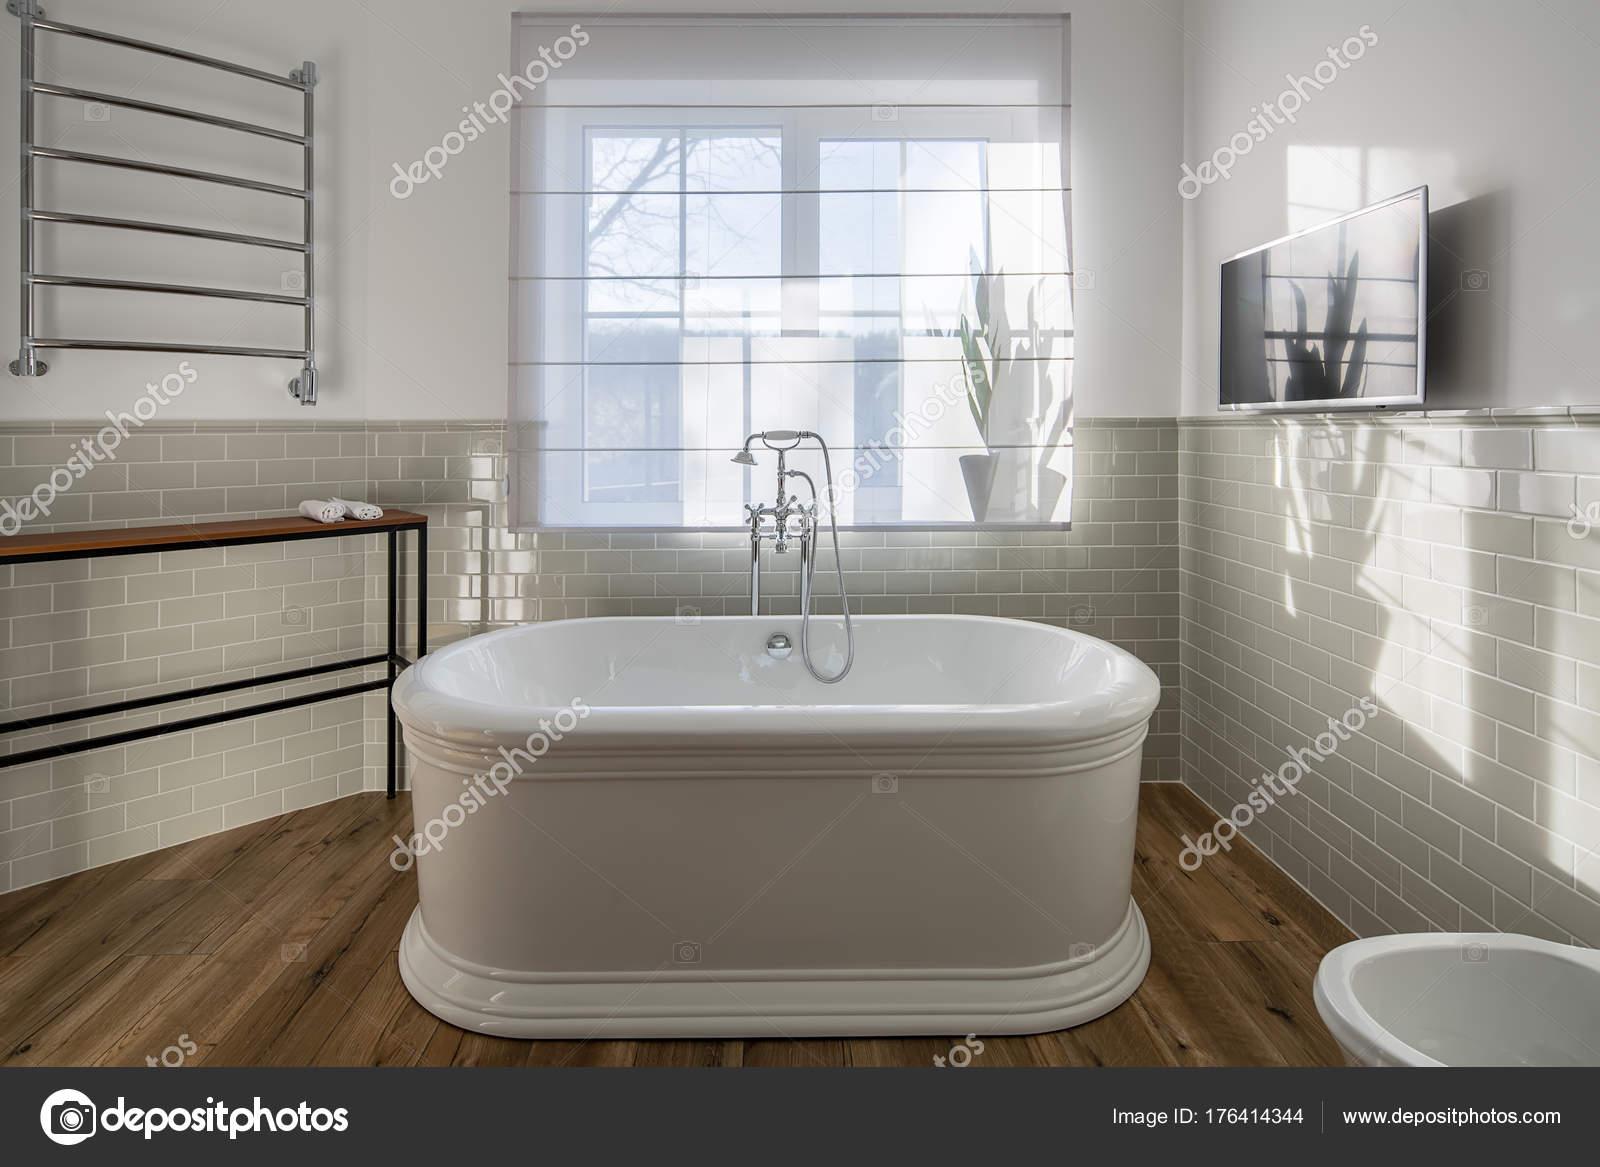 Badkamer in moderne stijl u2014 stockfoto © bezikus #176414344